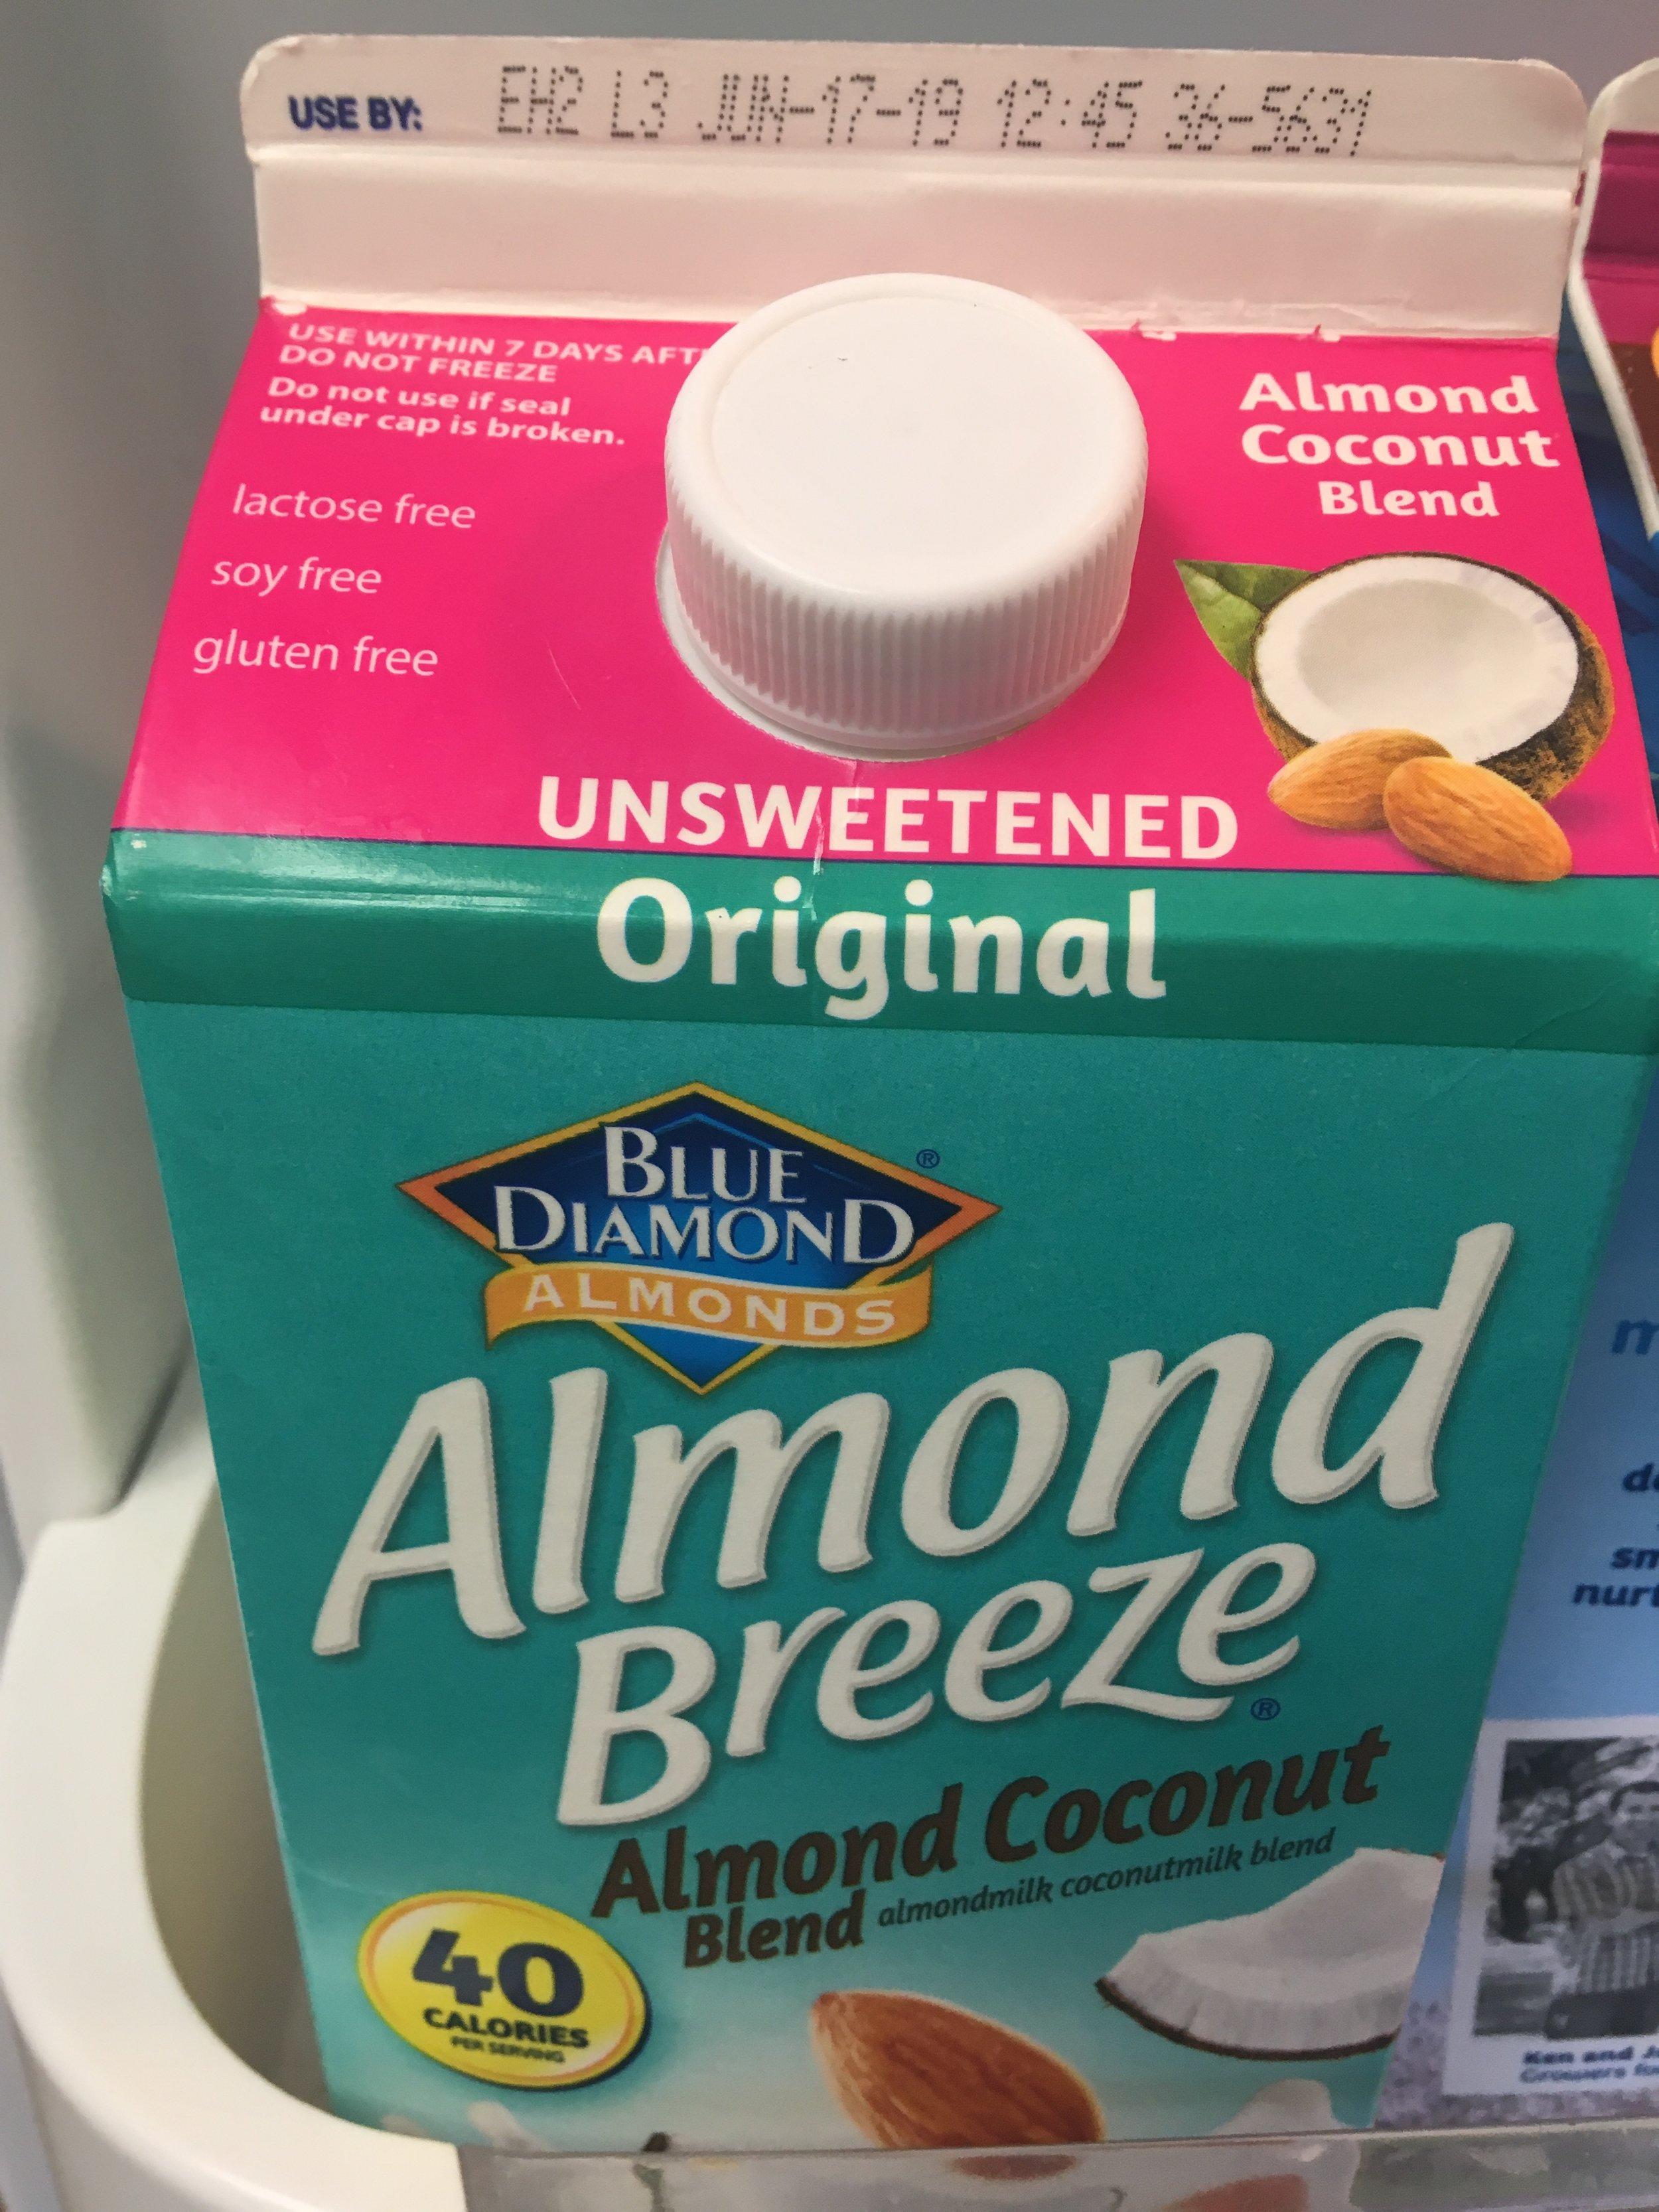 Unsweetened Coconut Almond Milk - Blue Diamond is so good!